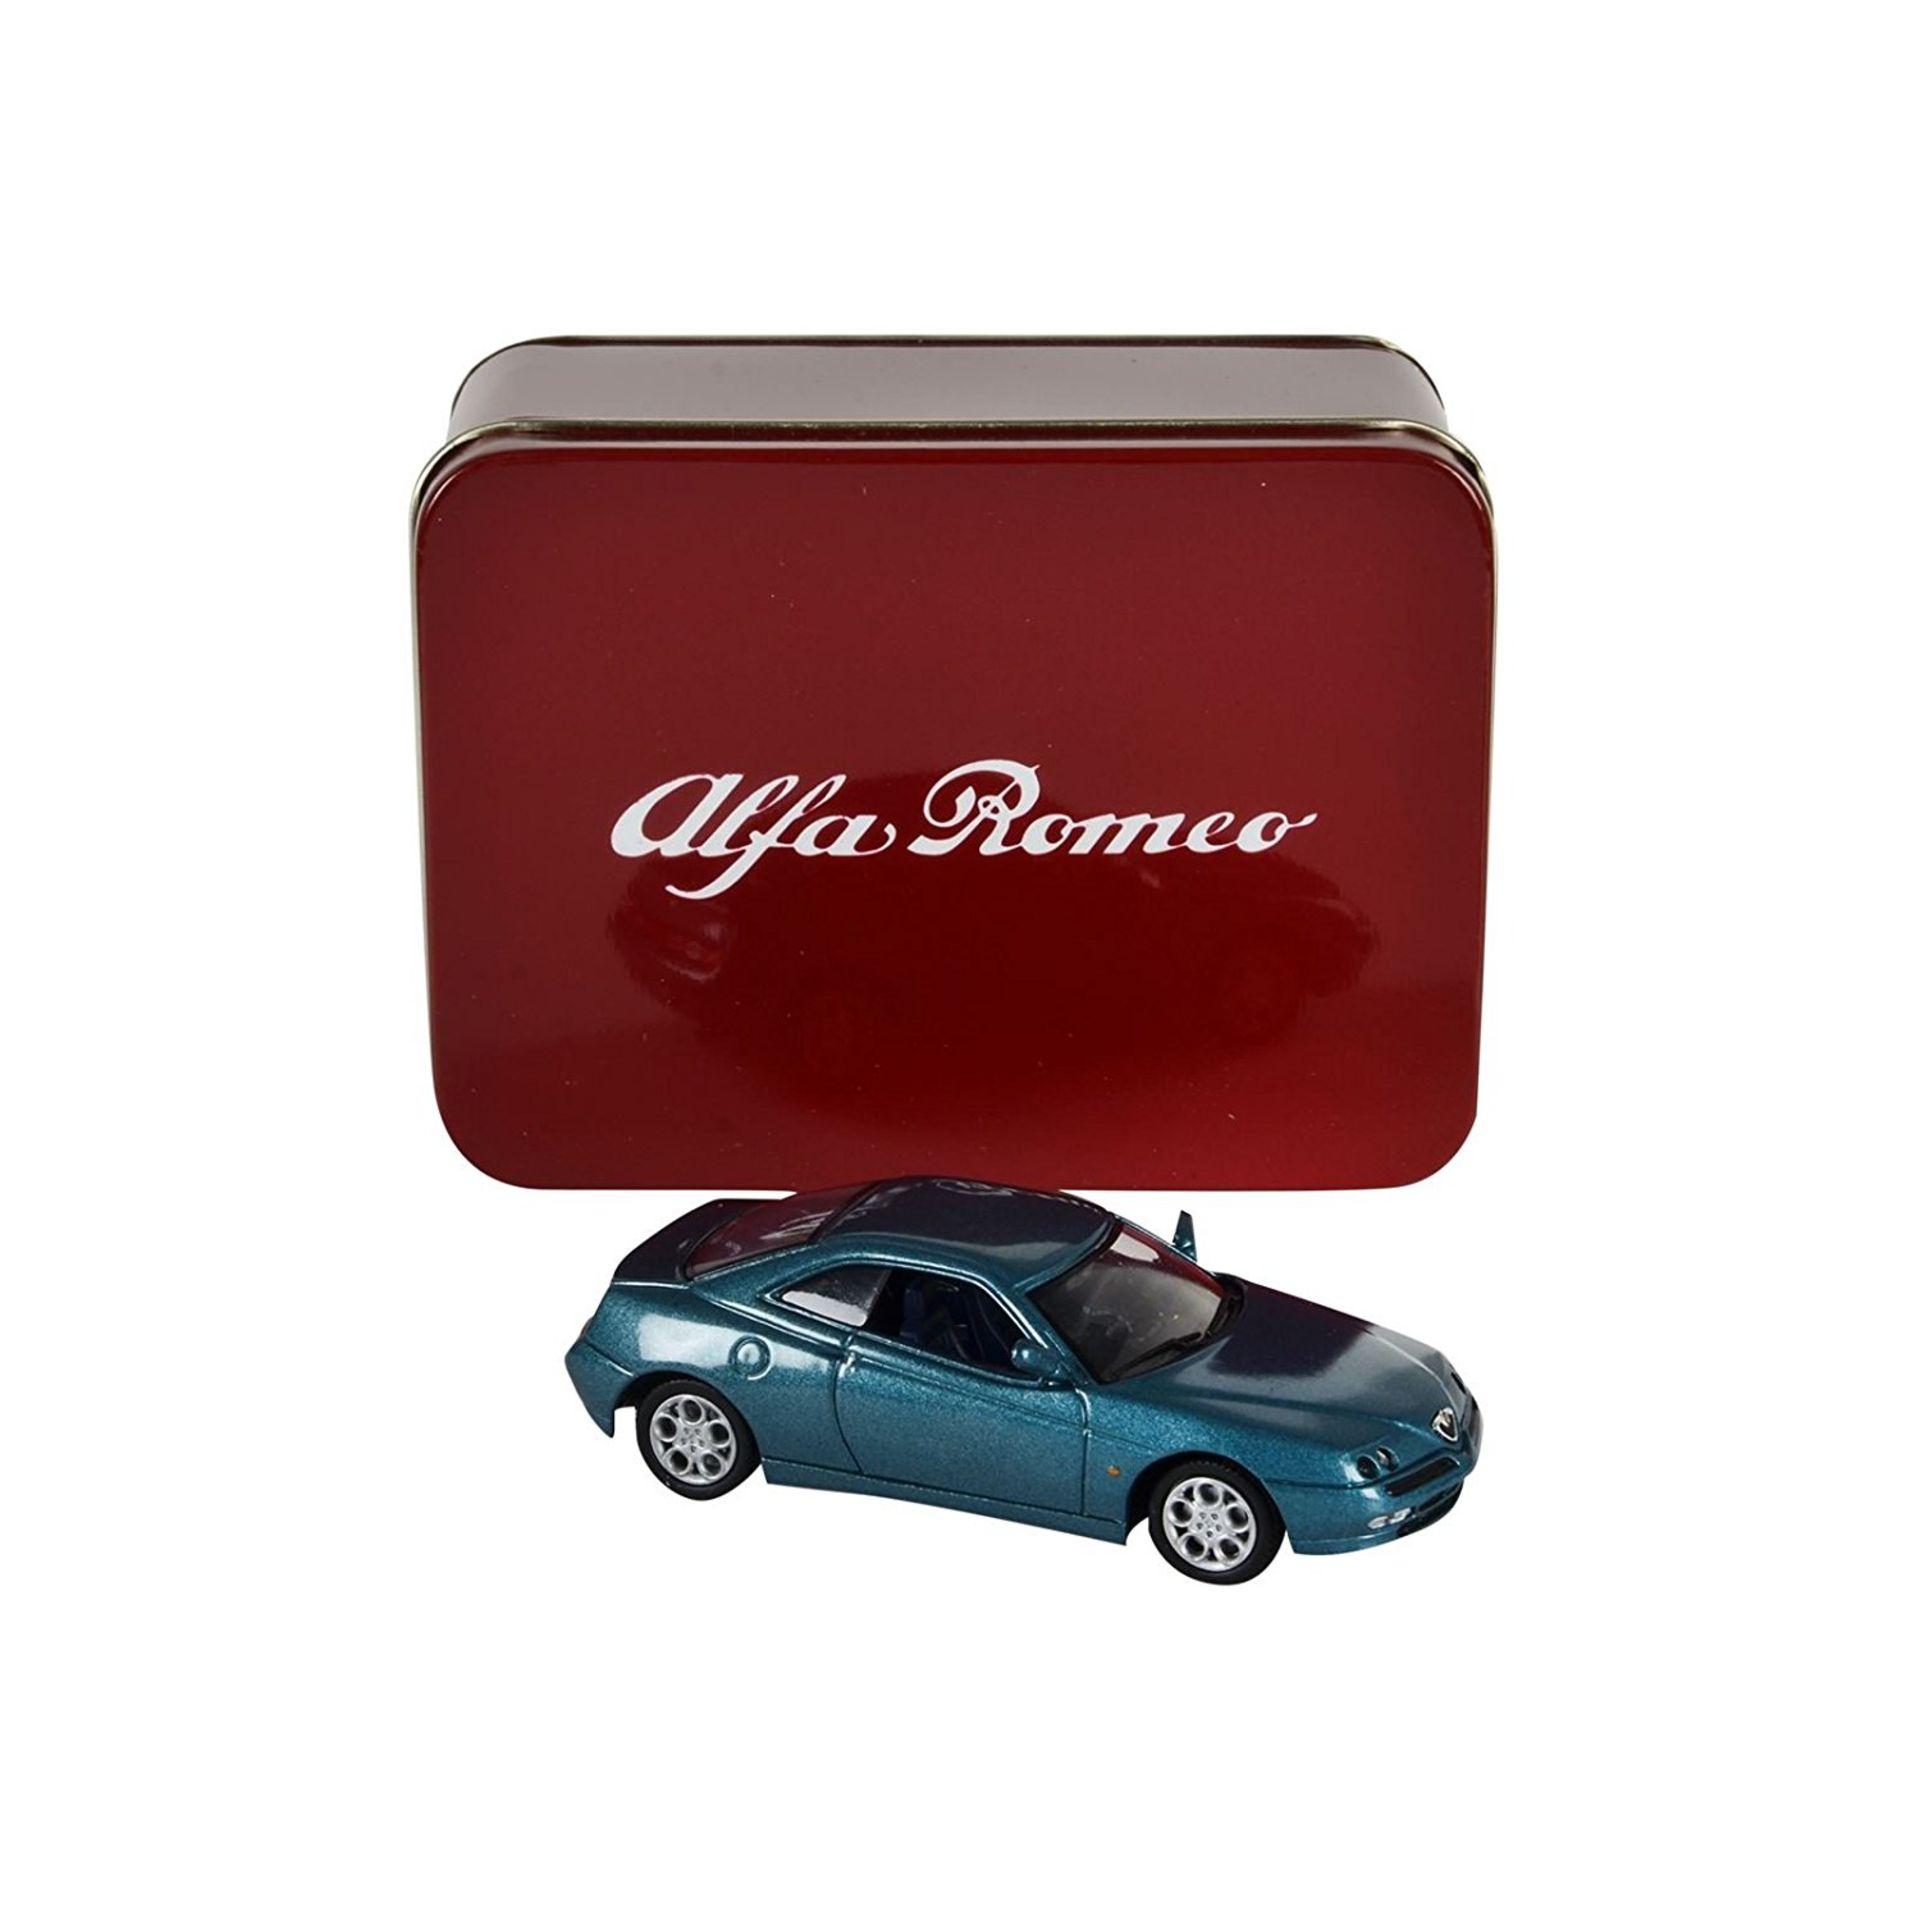 Lot 10374 - V Brand New 1/43 Diecast Model 1995 Alfa Romeo GTV - RRP £14.99